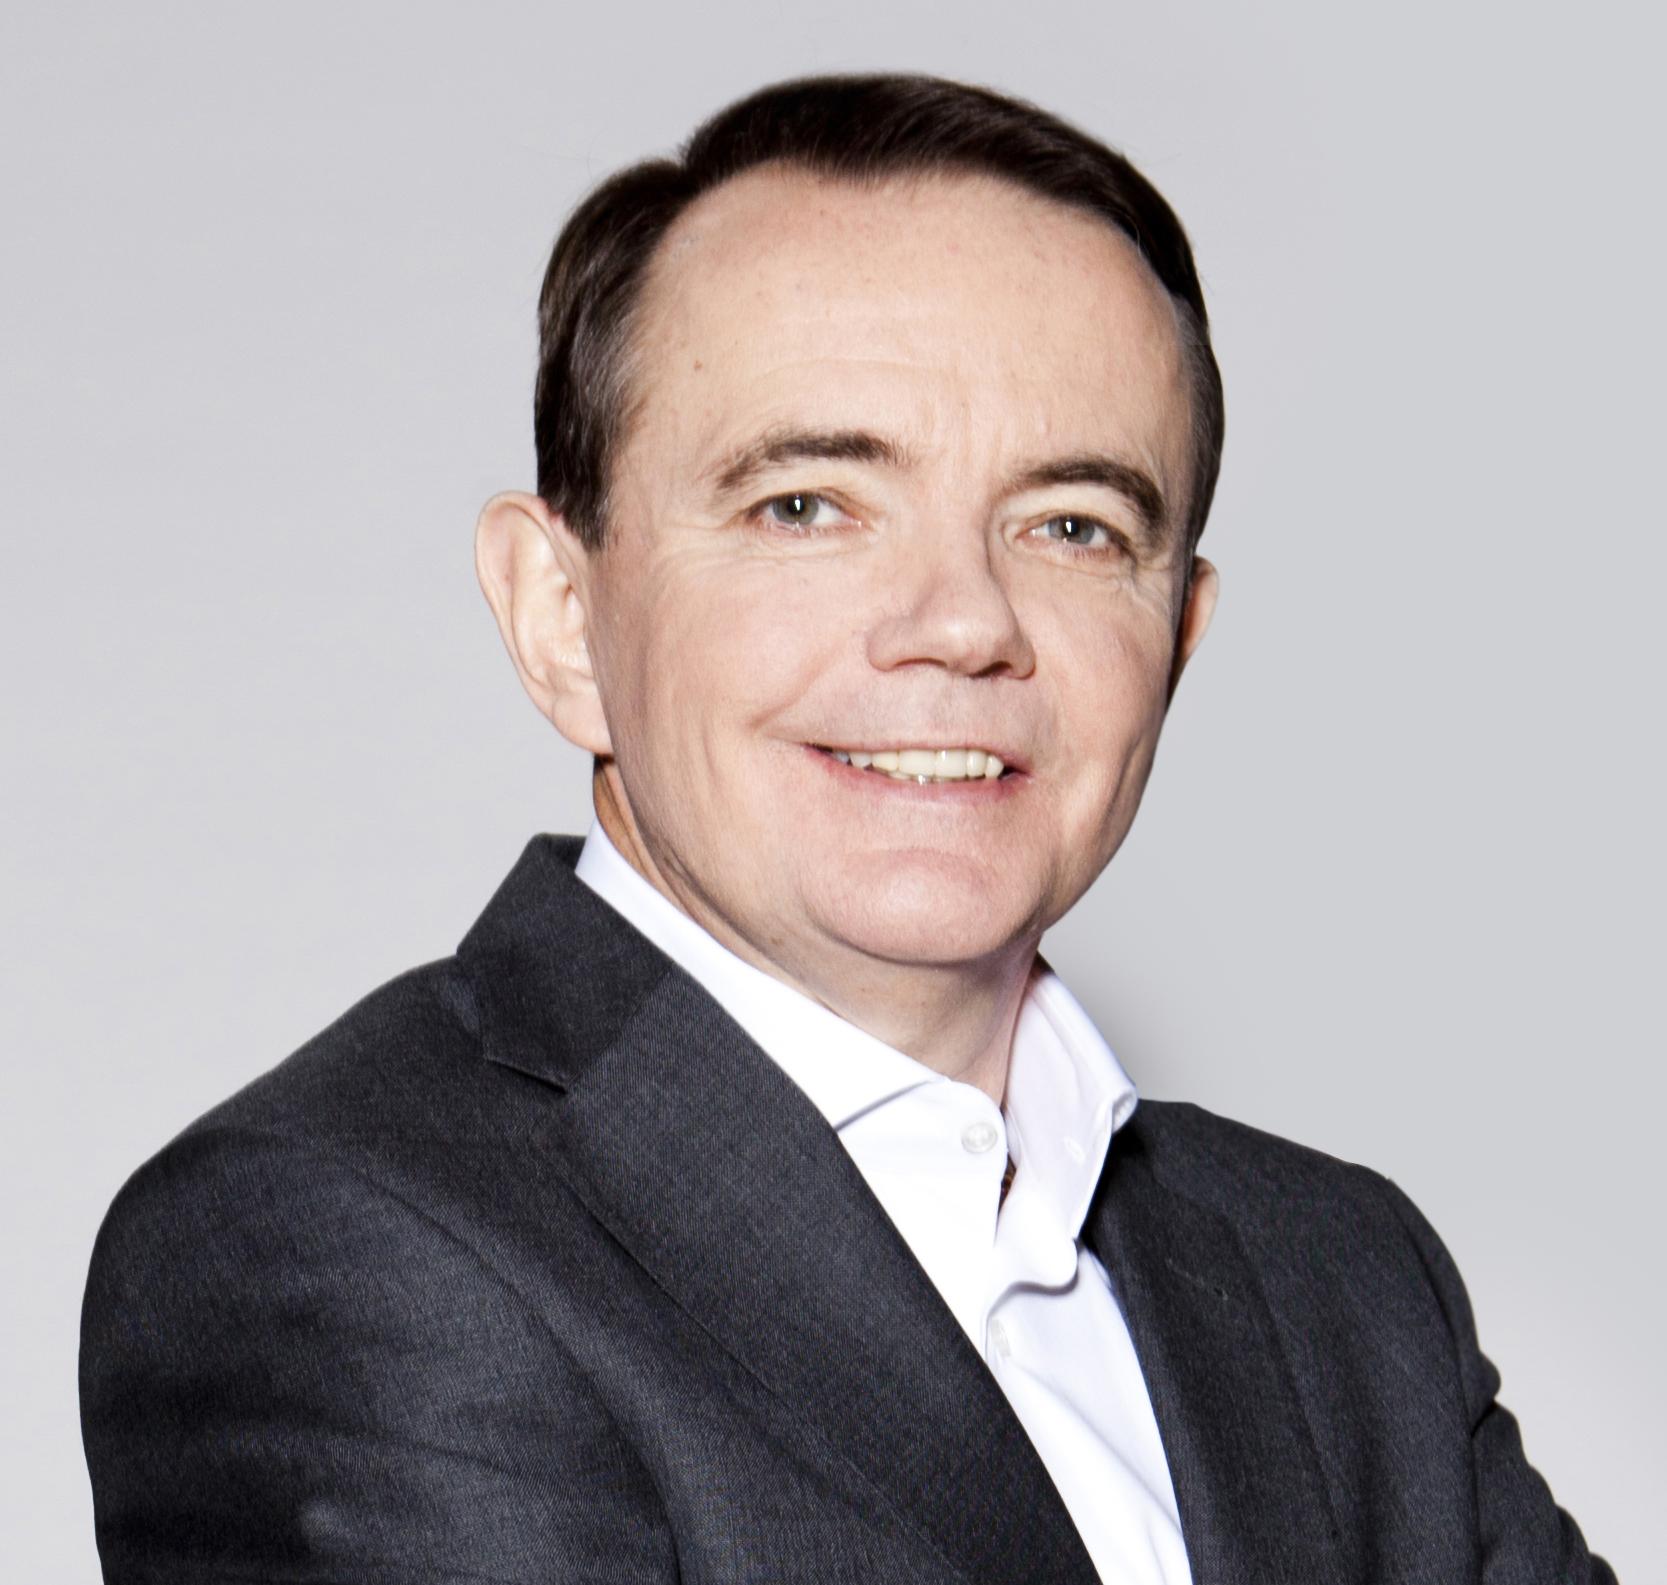 Barry O'Sullivan